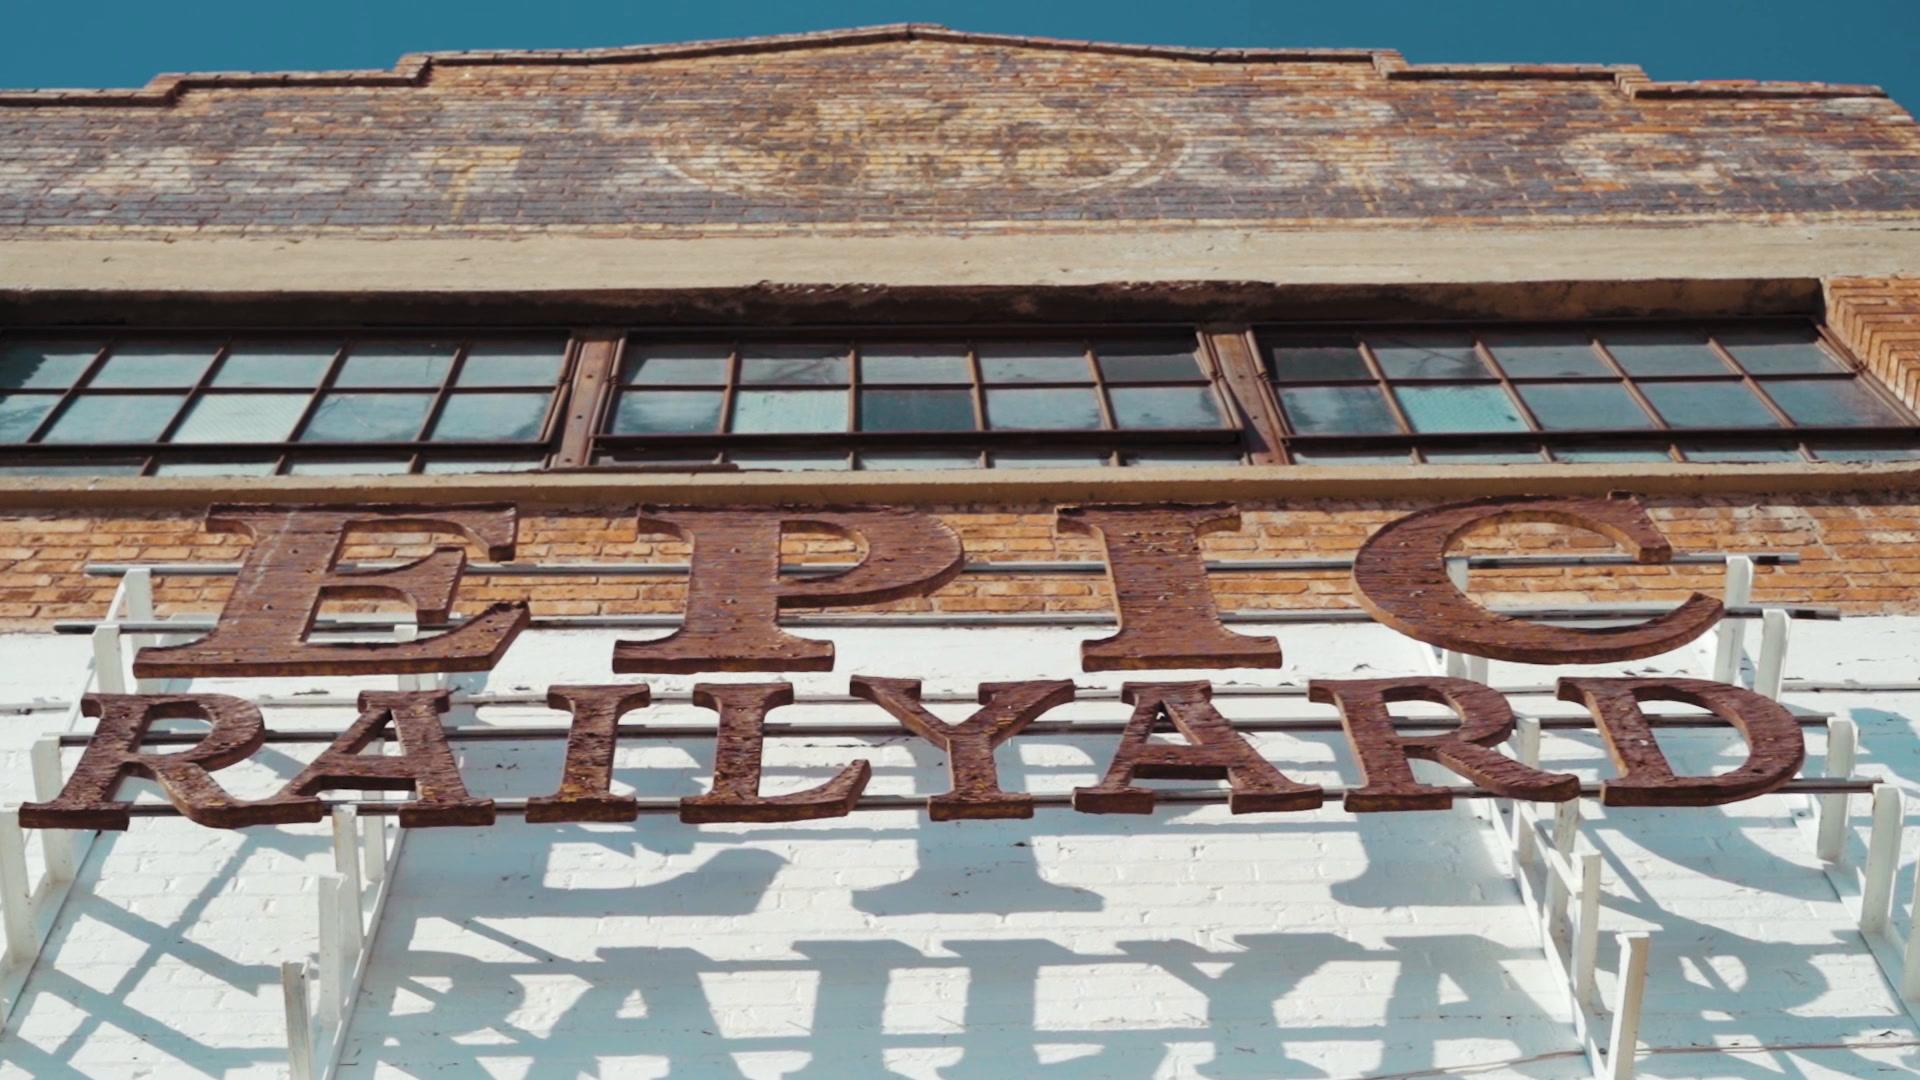 John + Lauren | El Paso, Texas | Epic Railyard